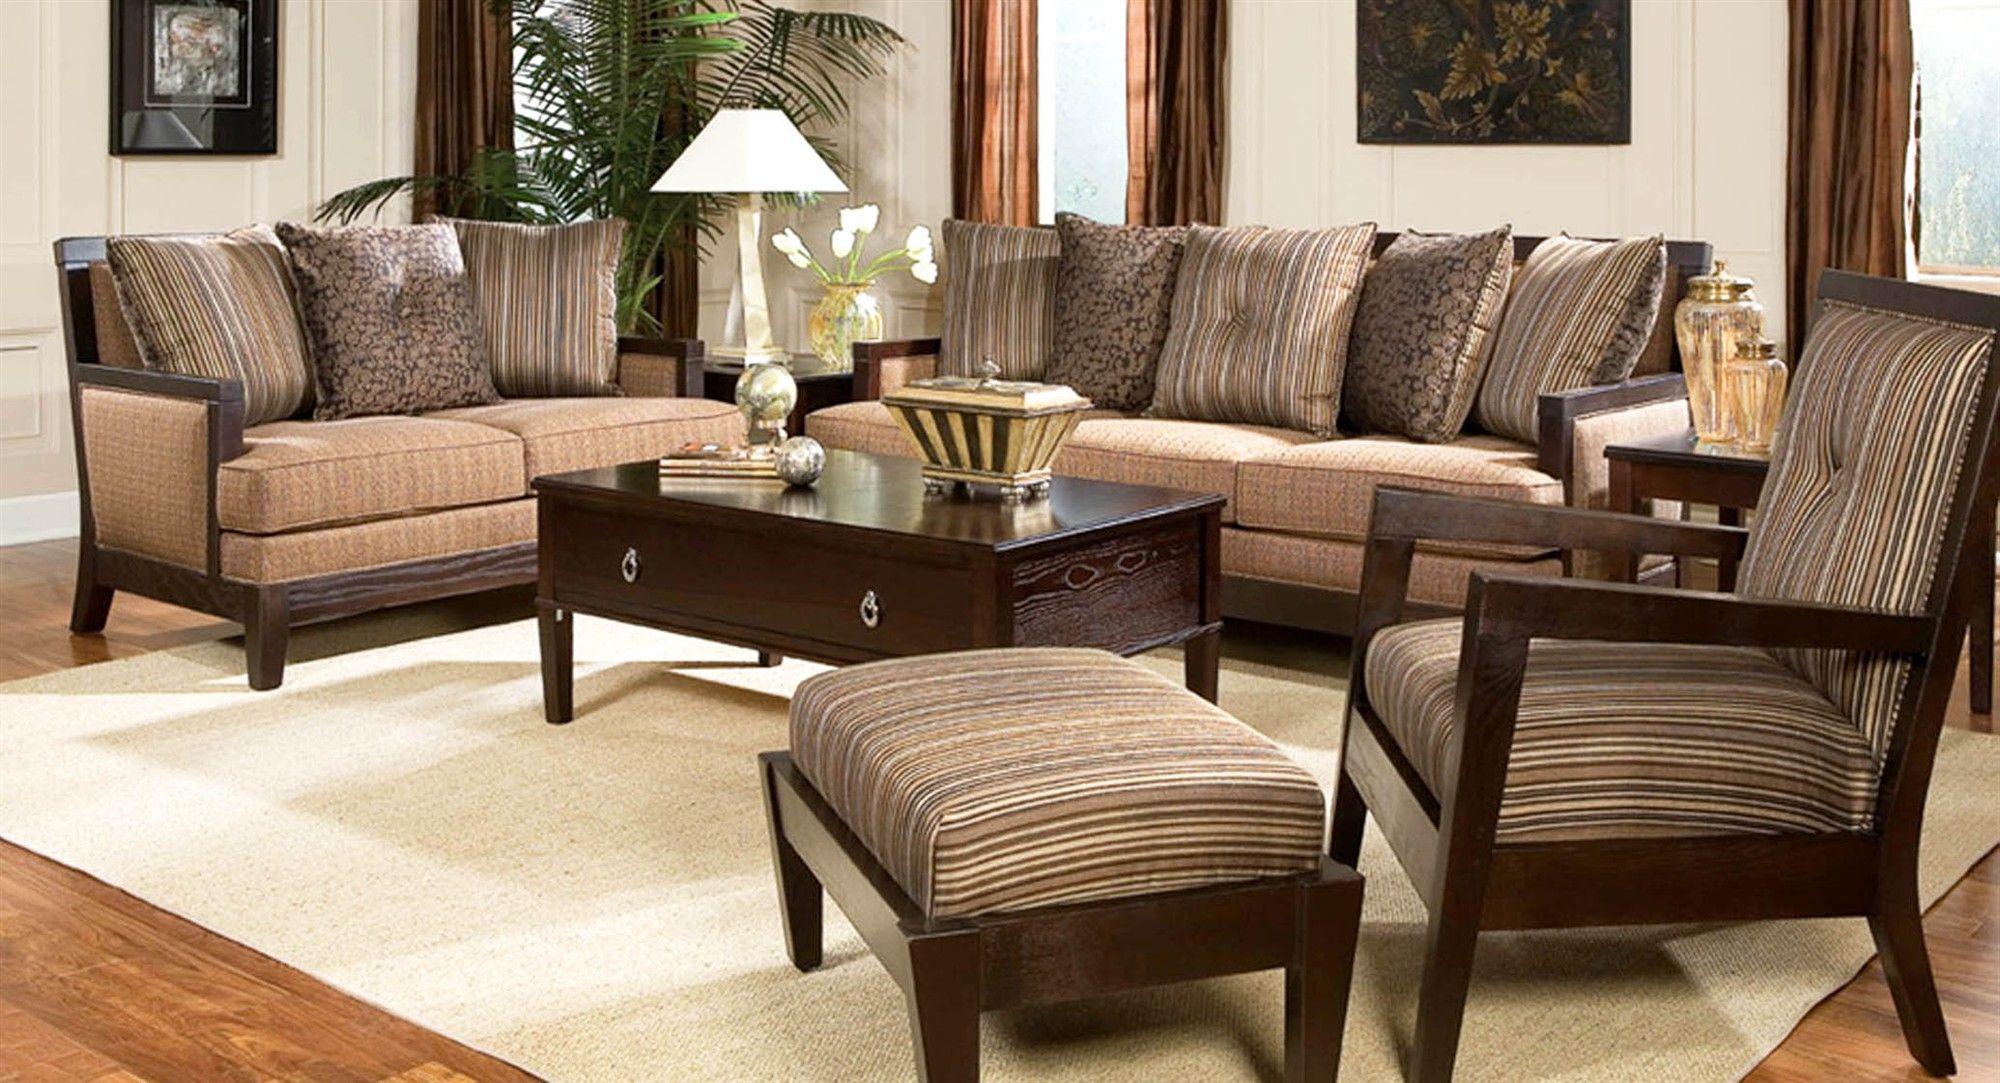 Buy Low Price Najarian Furniture Nikkie 3 Pc Living Room Set in ...